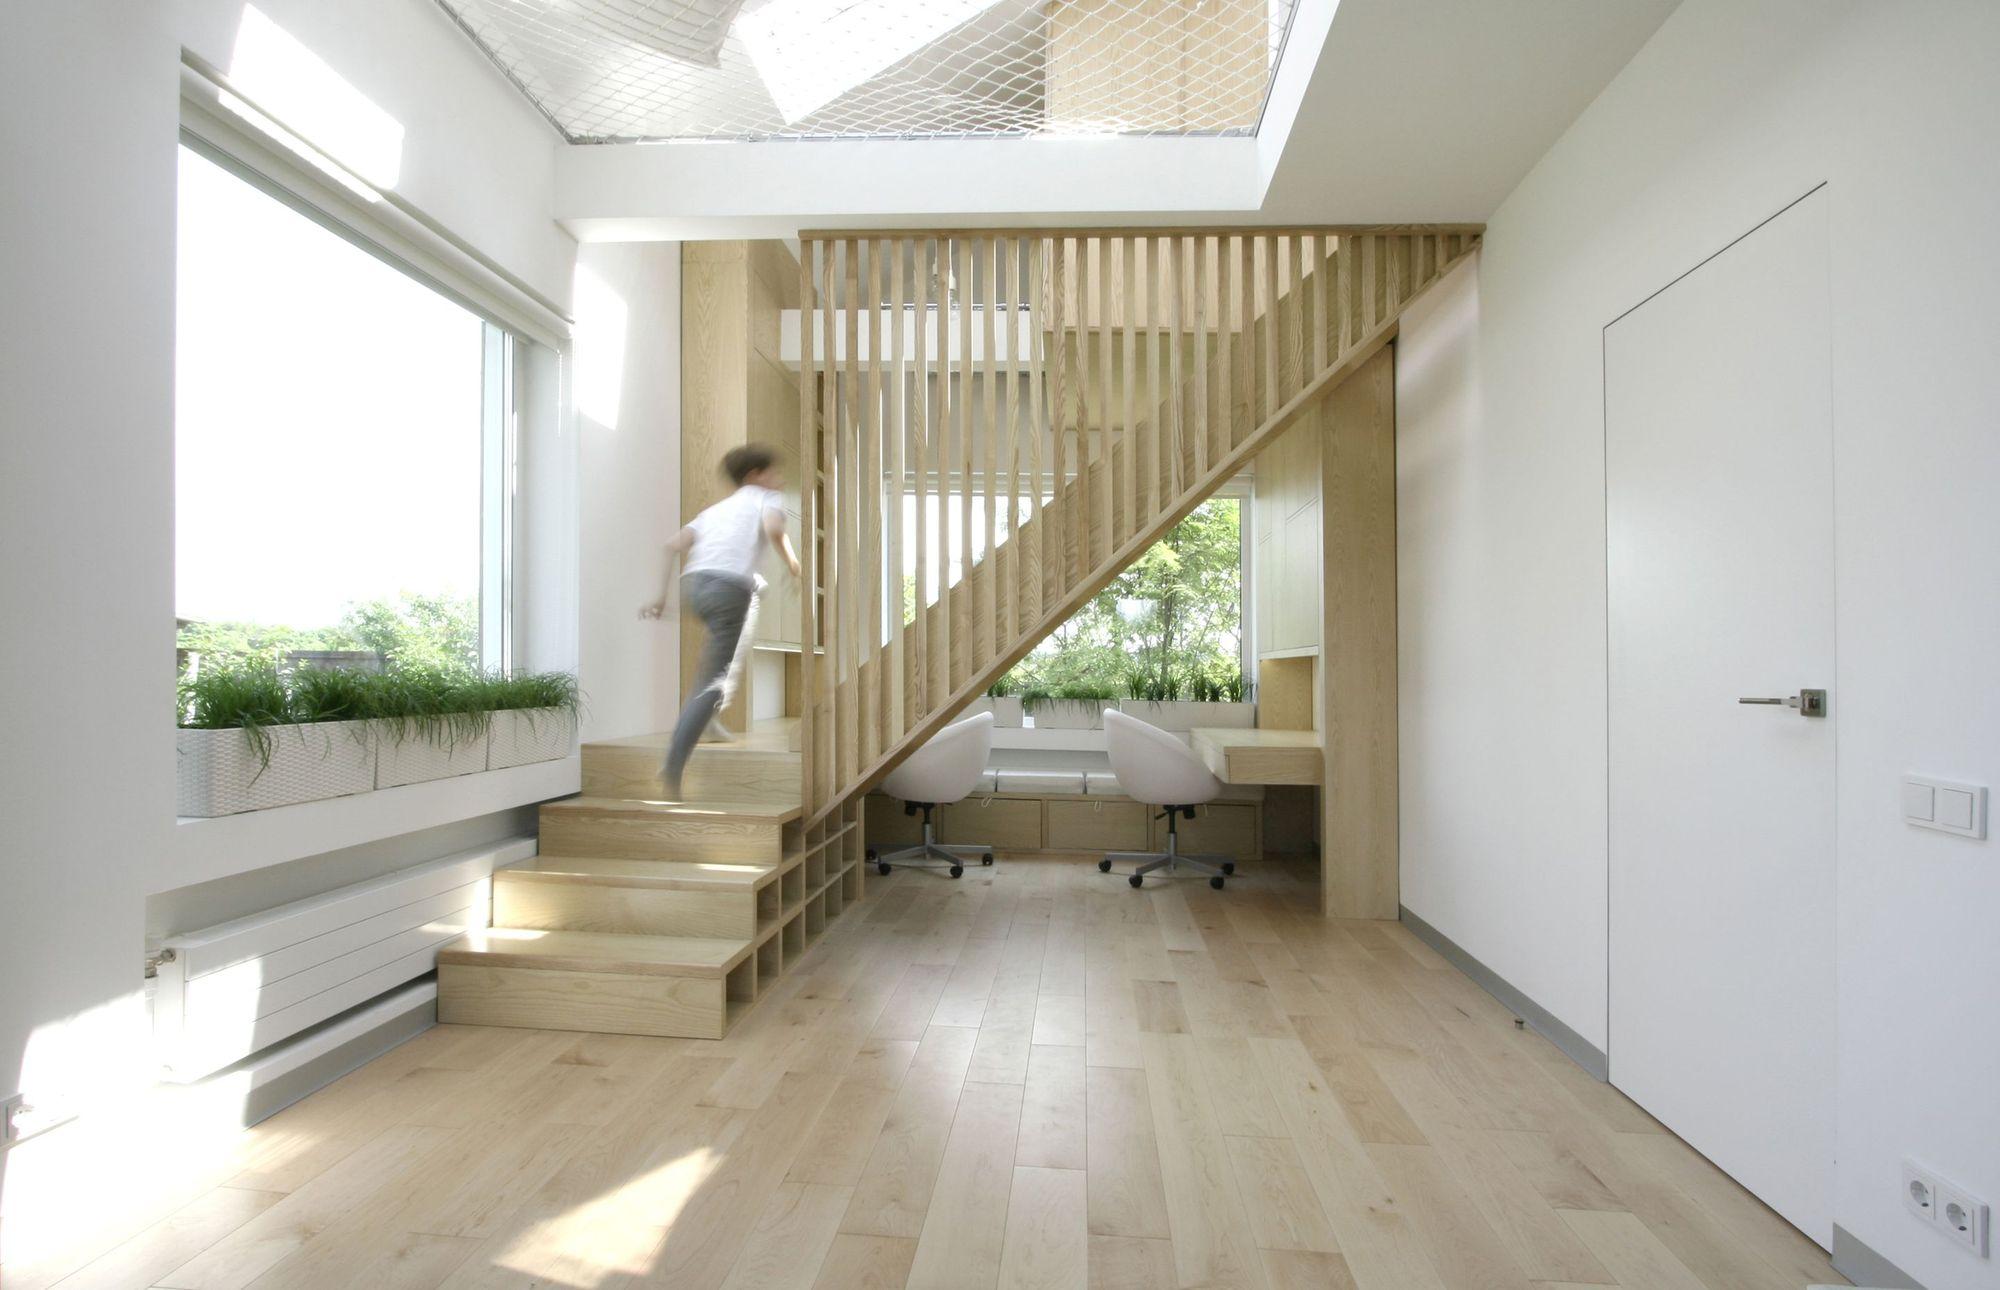 A Flexible Design Transforms A Studio Into A Work And Study Paradise